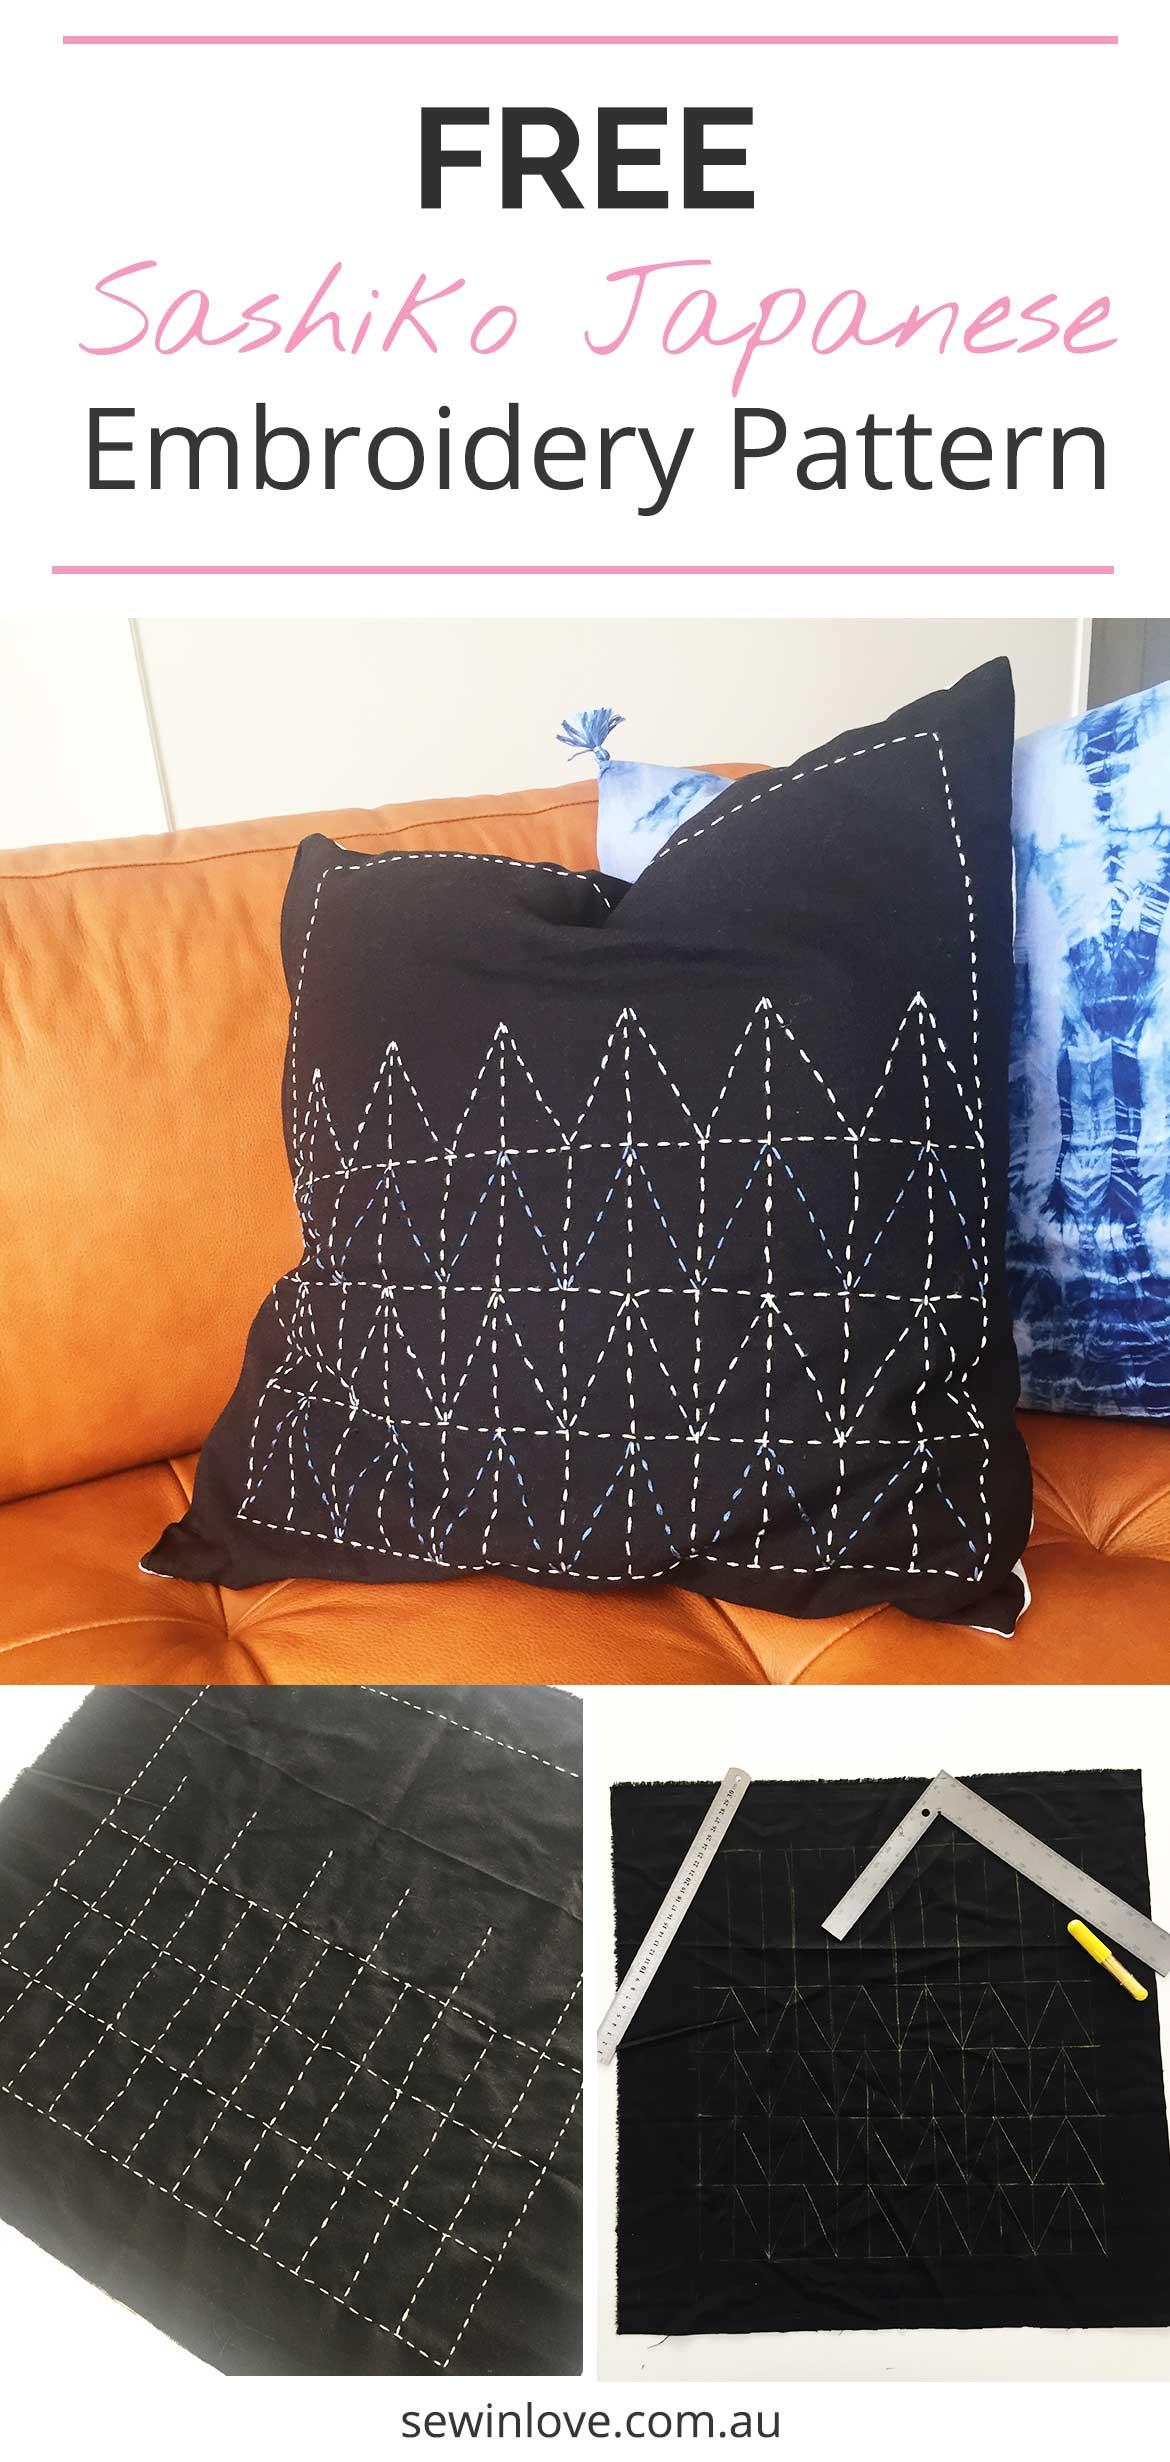 Free Sashiko Embroidery Pattern | Make a boho pillow cushion using the traditional Japanese embroidery method - sashiko. Get this free embriodery pattern!